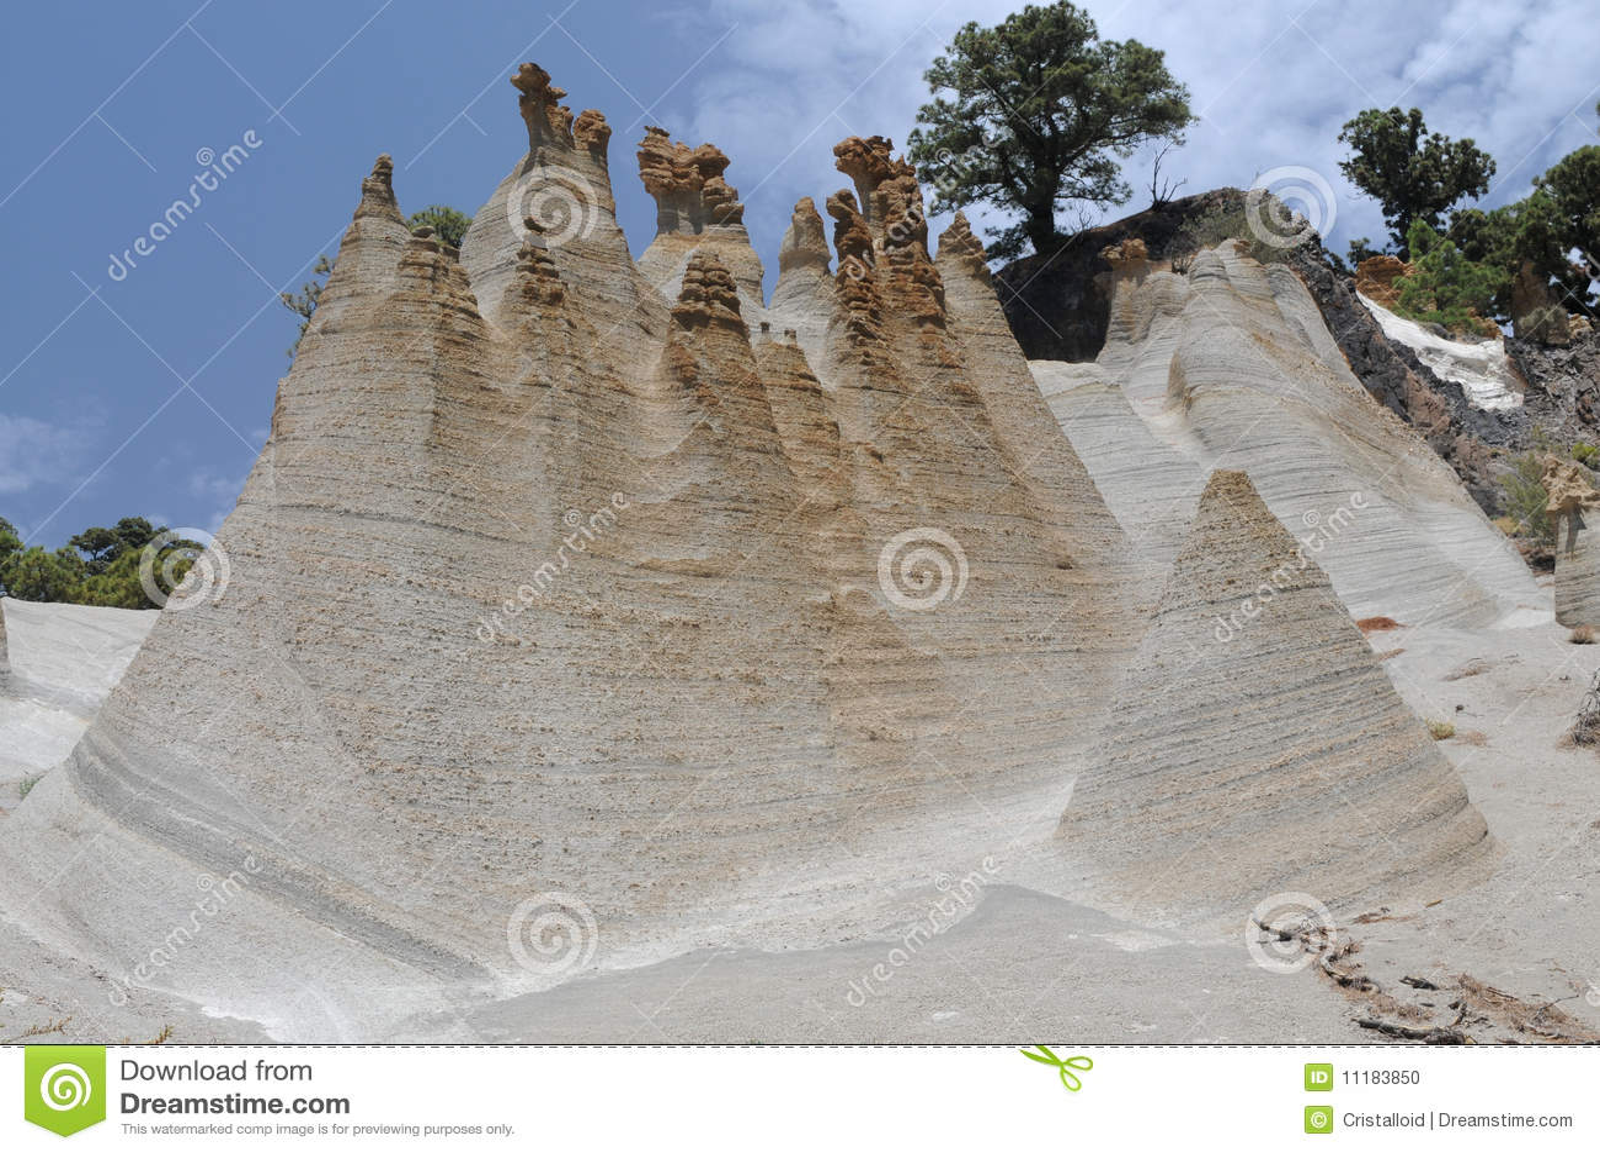 Tuff formations